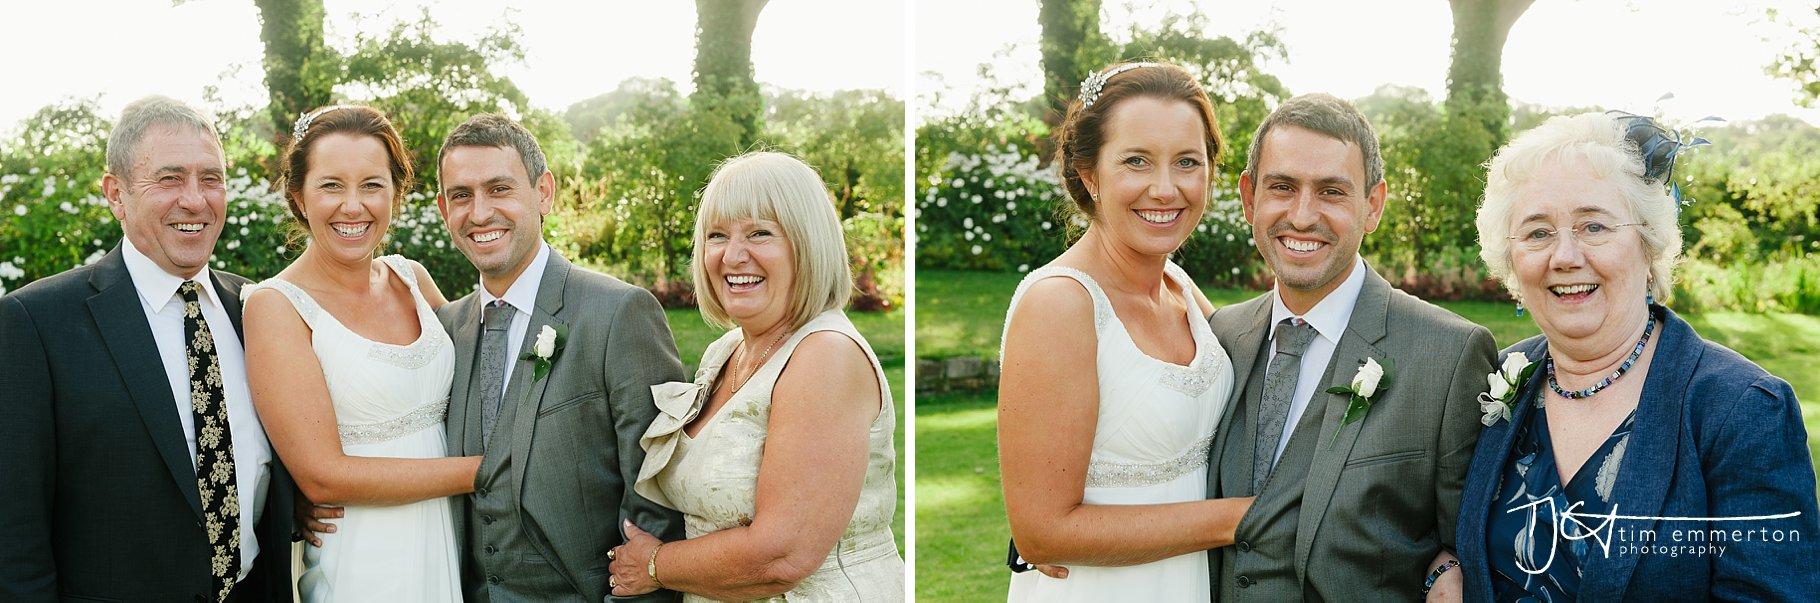 Northcote-Wedding-Photos-321.jpg